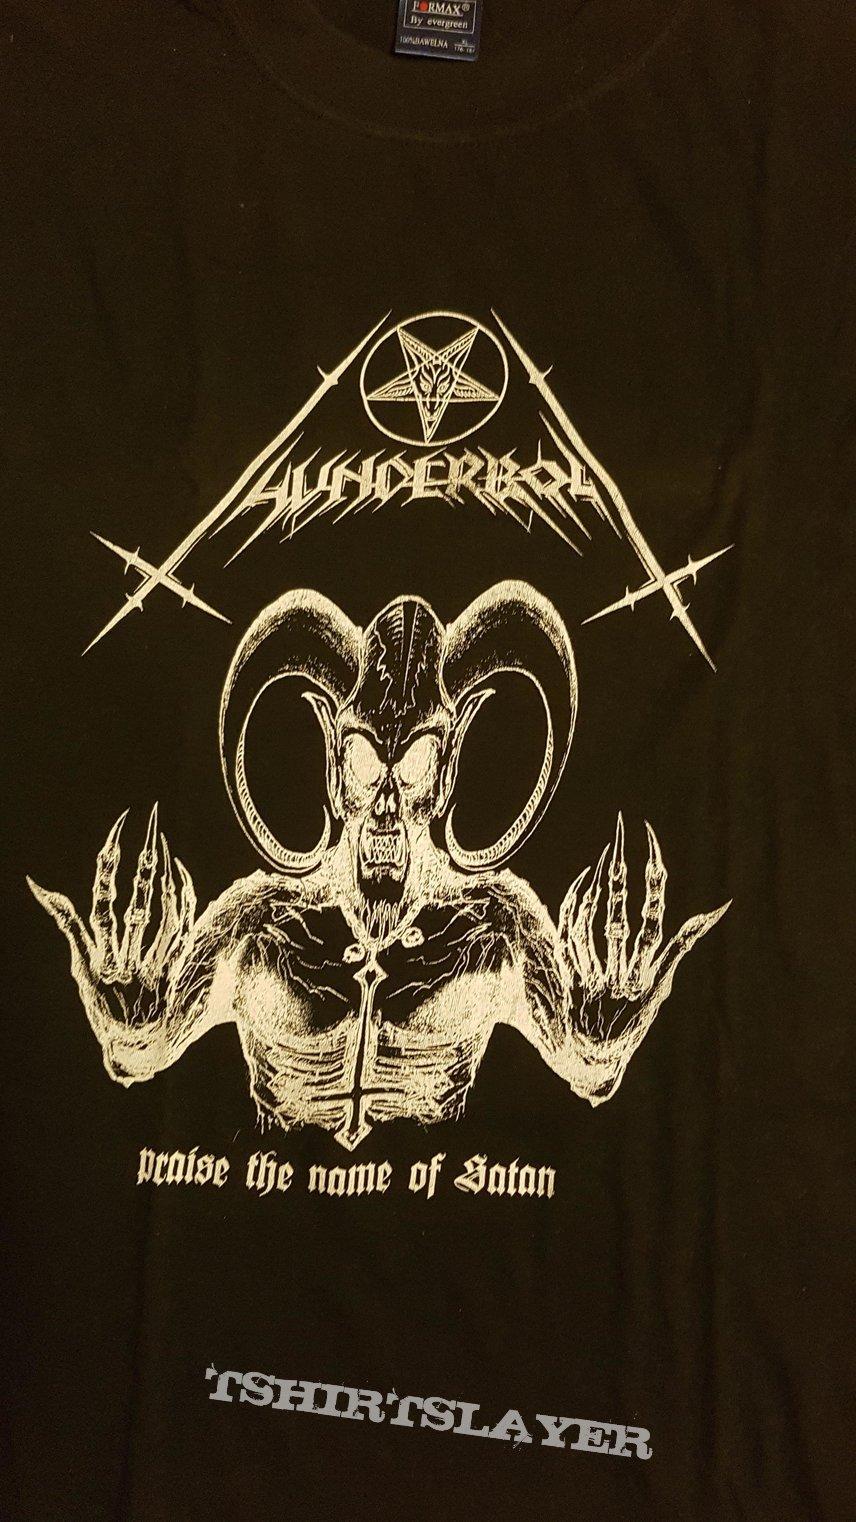 Thunderbolt - Praise the Name of Satan